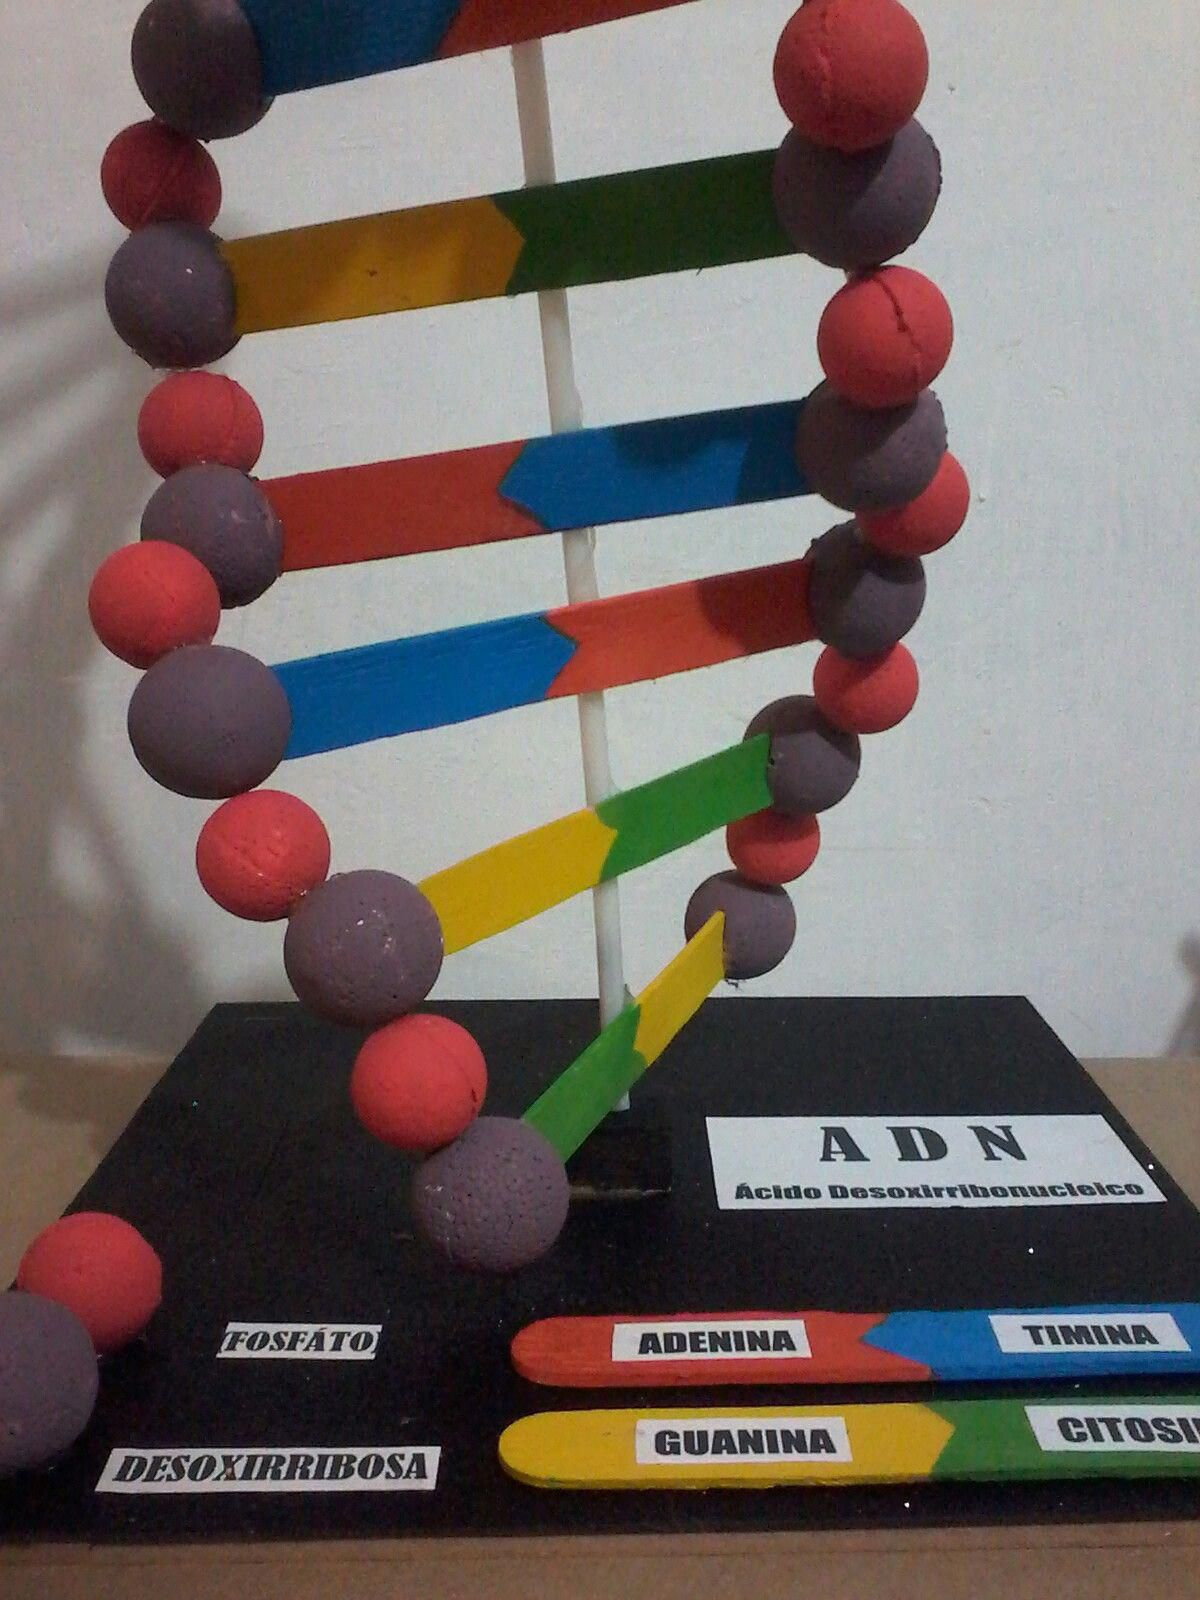 3D Printing Ideas DIY Simple 3DPrinterKidsDesign Dna